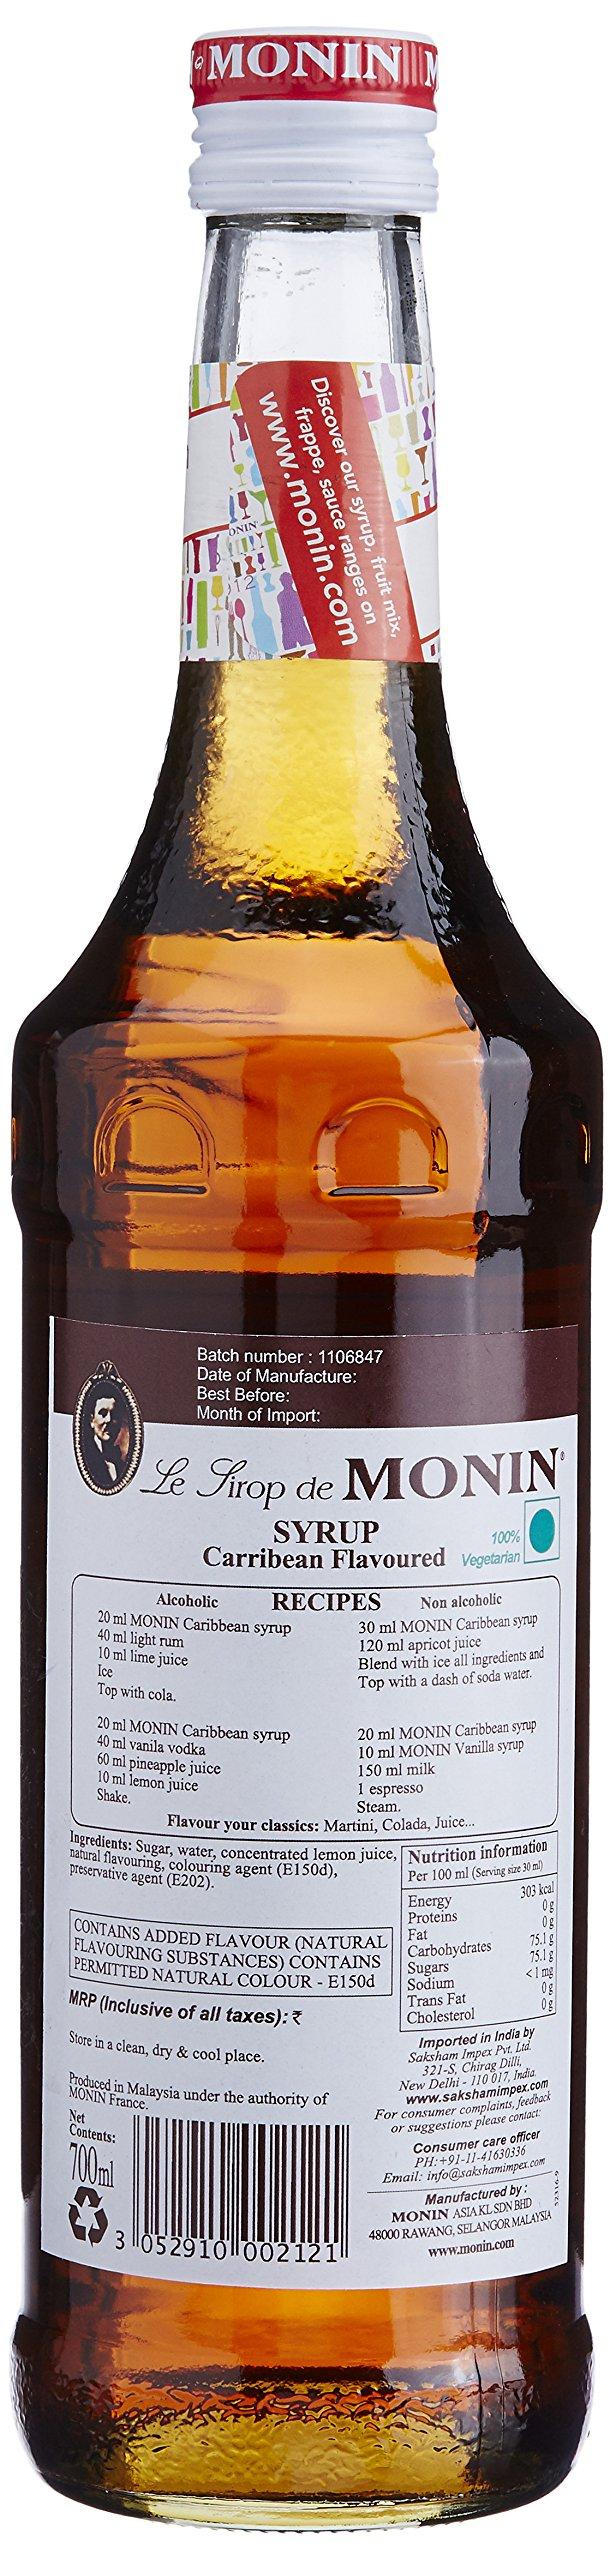 Monin-Premium-Caribbean-Syrup-700-ml